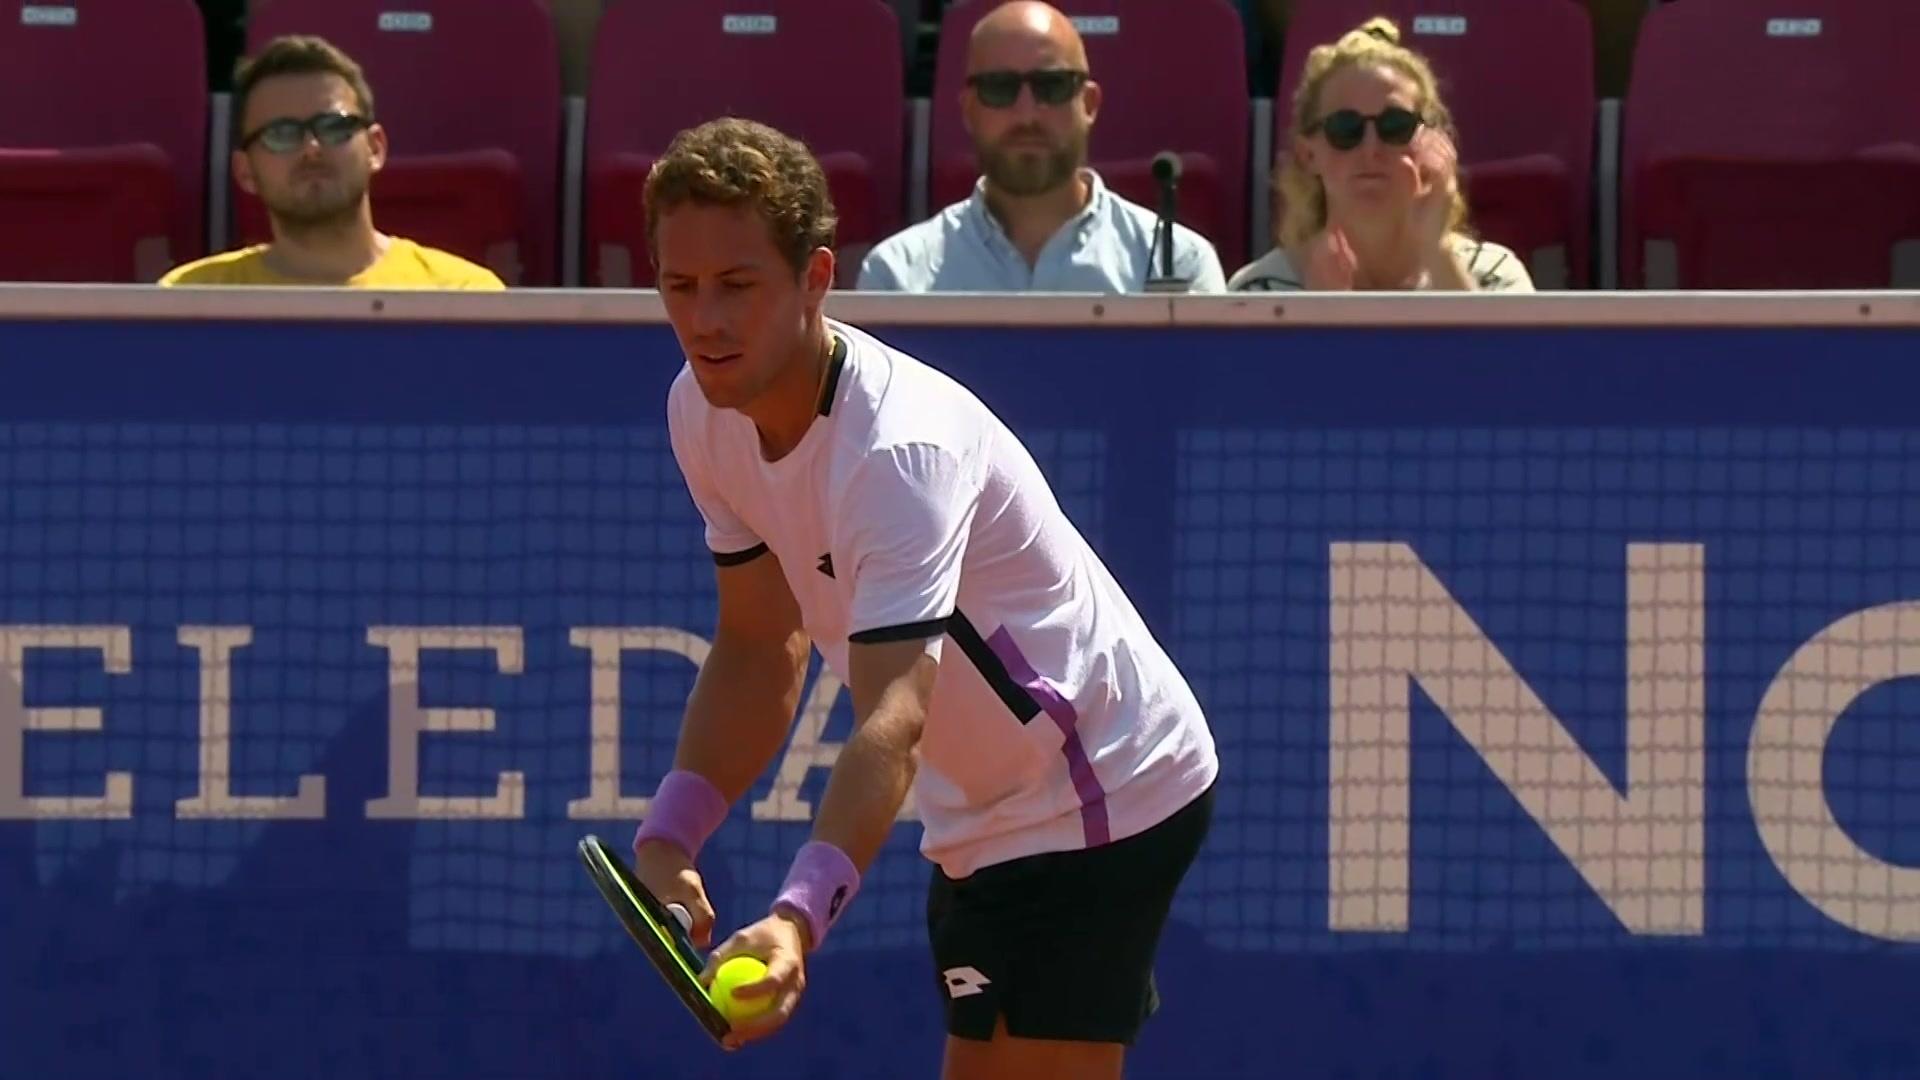 ATP 250 Torneo Bastad: F. Fognini - R. Carballés Baena